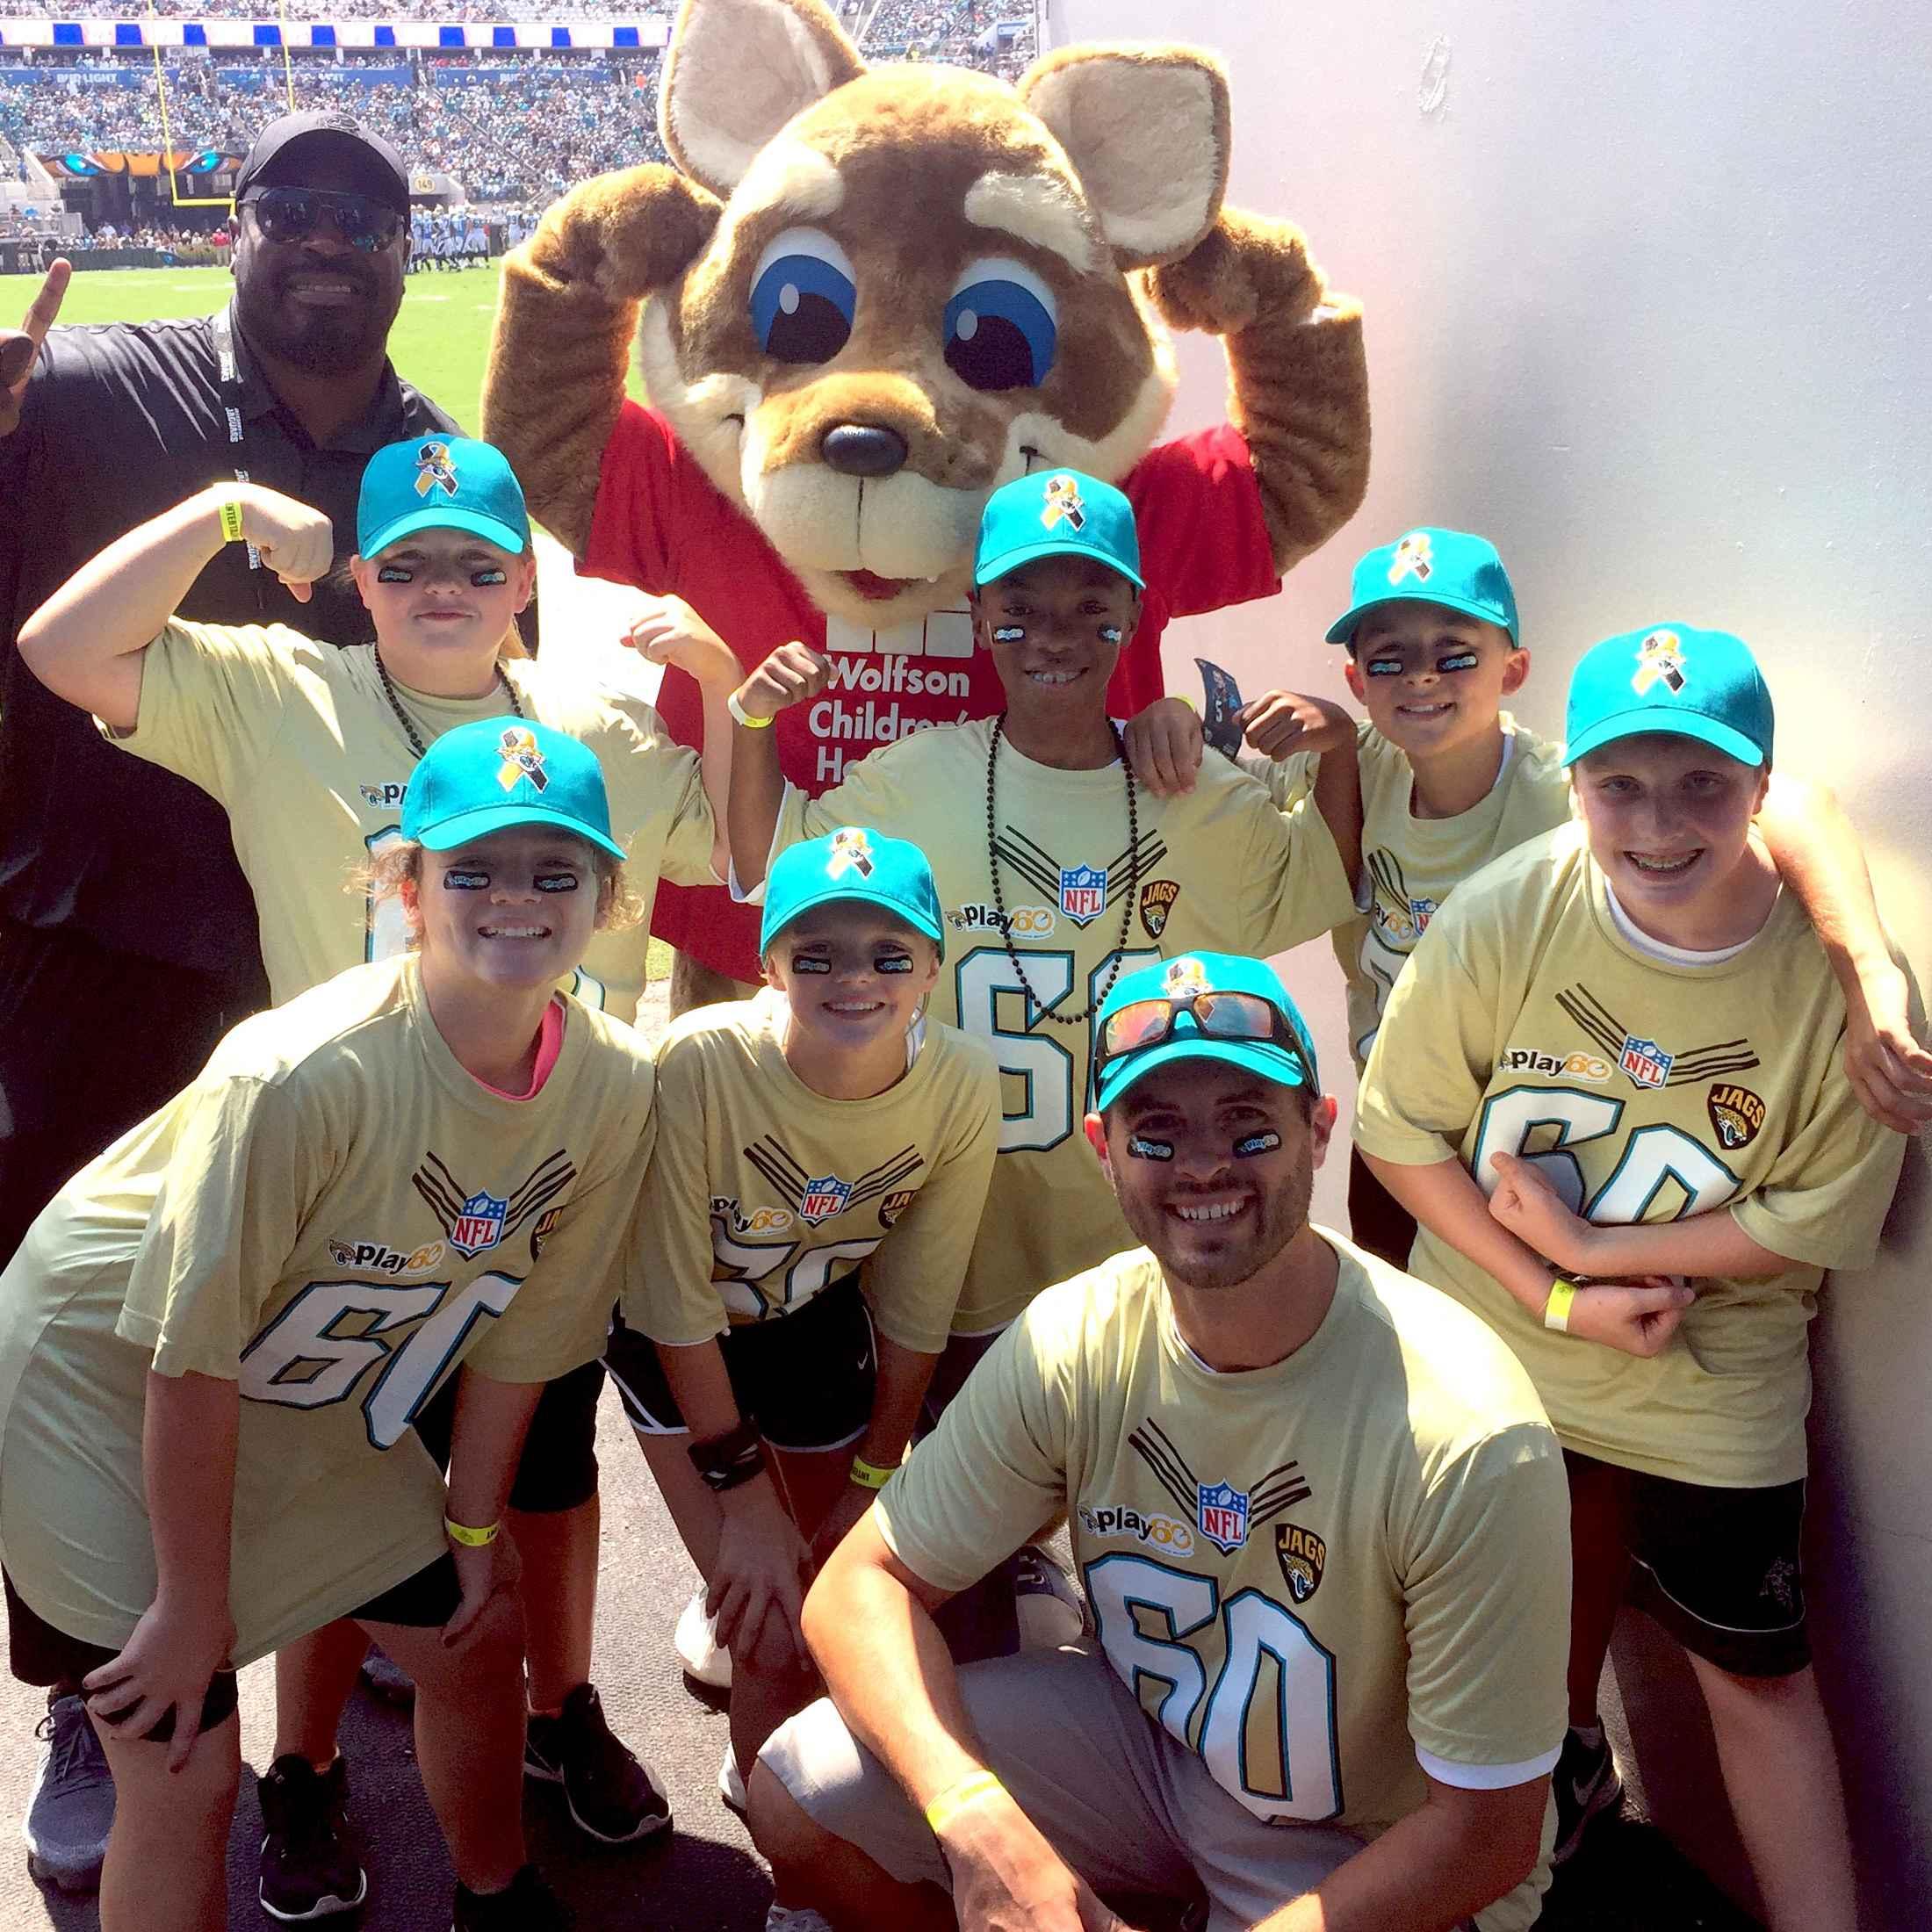 Wolfson Children's Hospital Health and Wellness